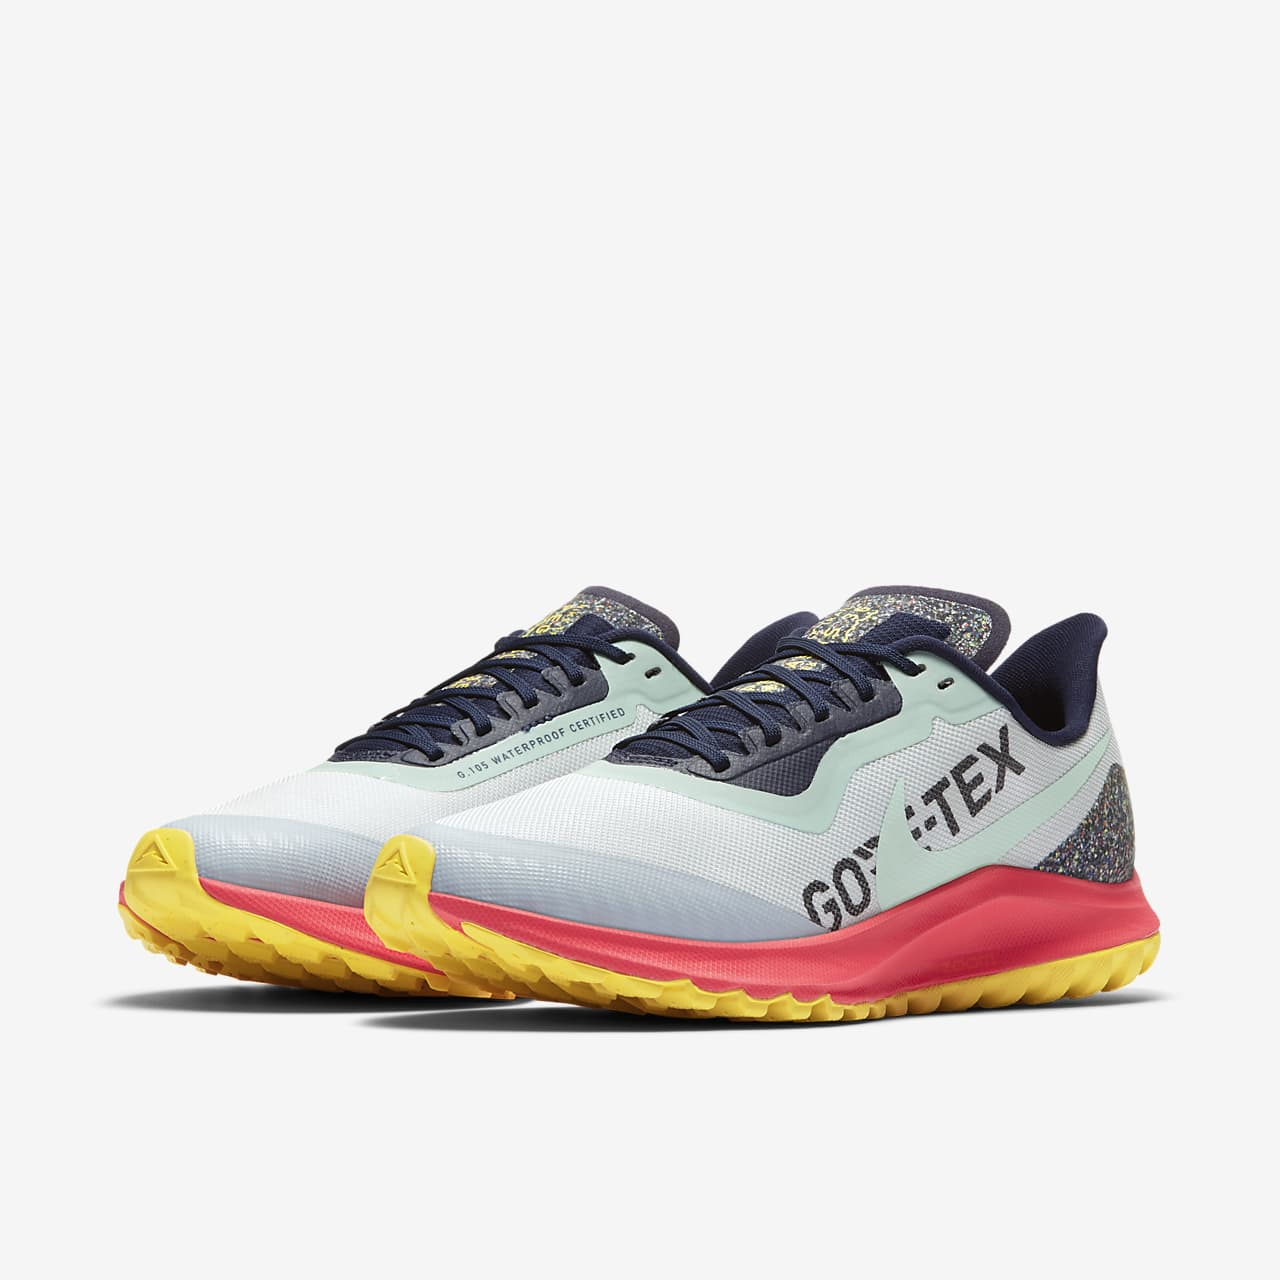 Chaussure de running sur sentier Nike Air Zoom Pegasus 36 Trail GORE TEX pour Femme